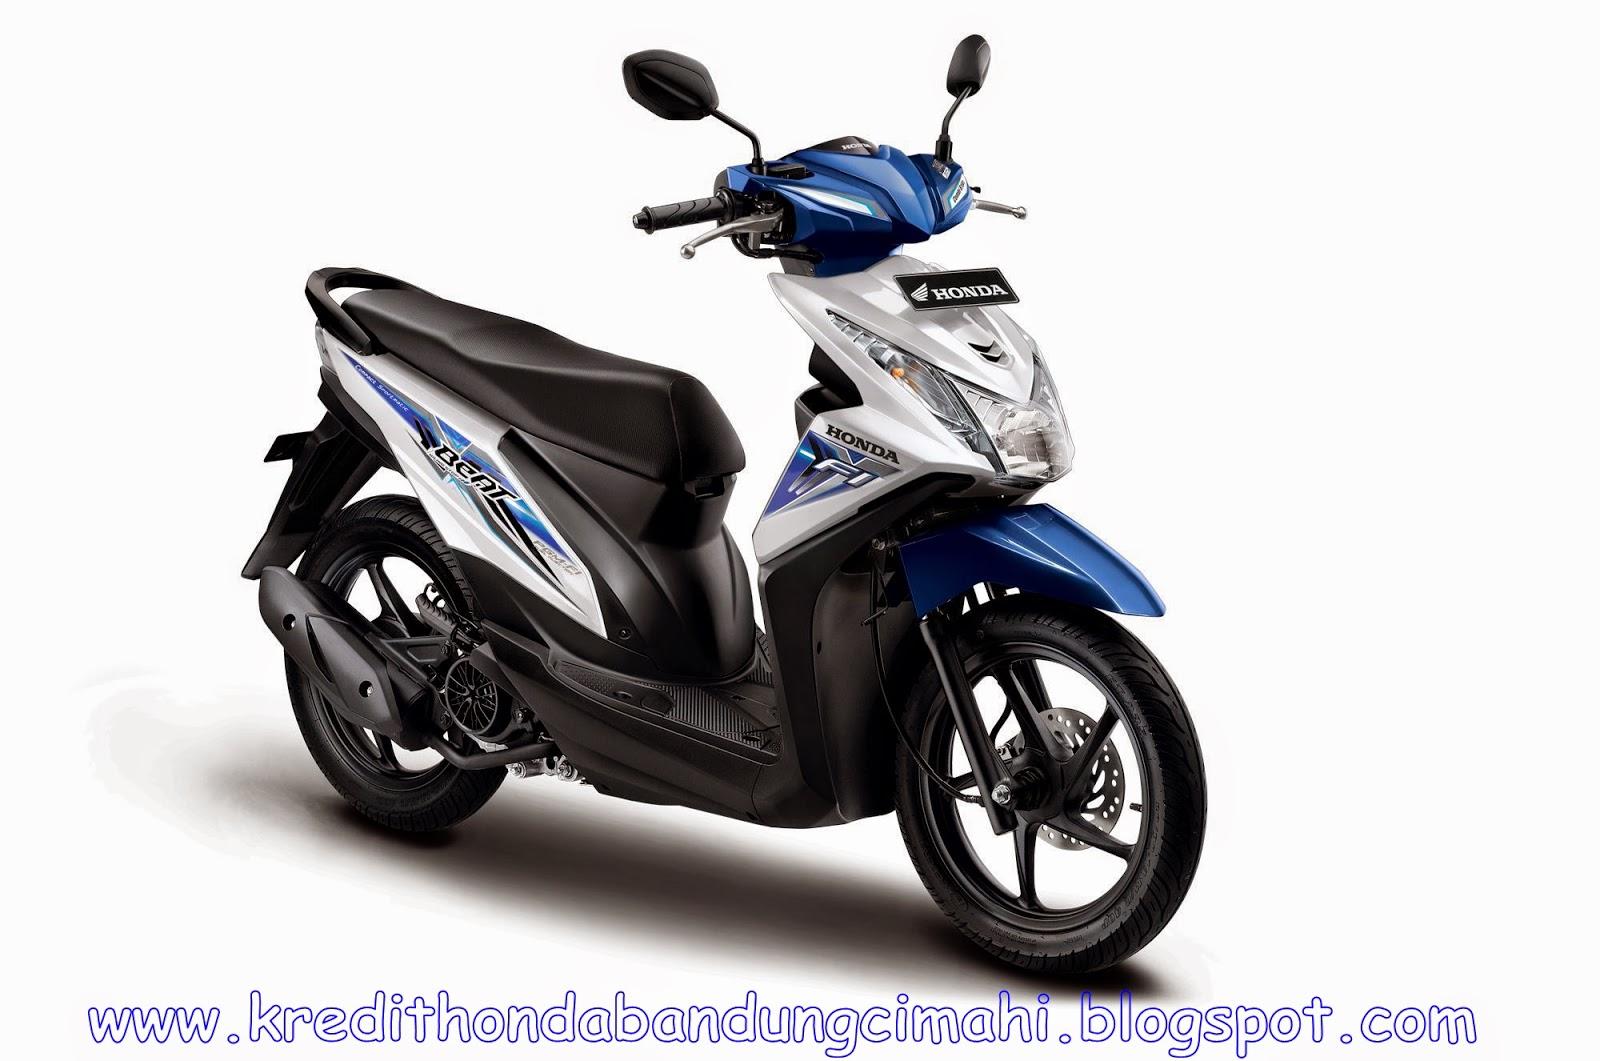 Honda Beat Sporty Cbs Funk Red White Update Daftar Harga Terbaru New Vario 110 Esp Iss Estilo Black Depok Kredit Motor Murah Di Bandung All